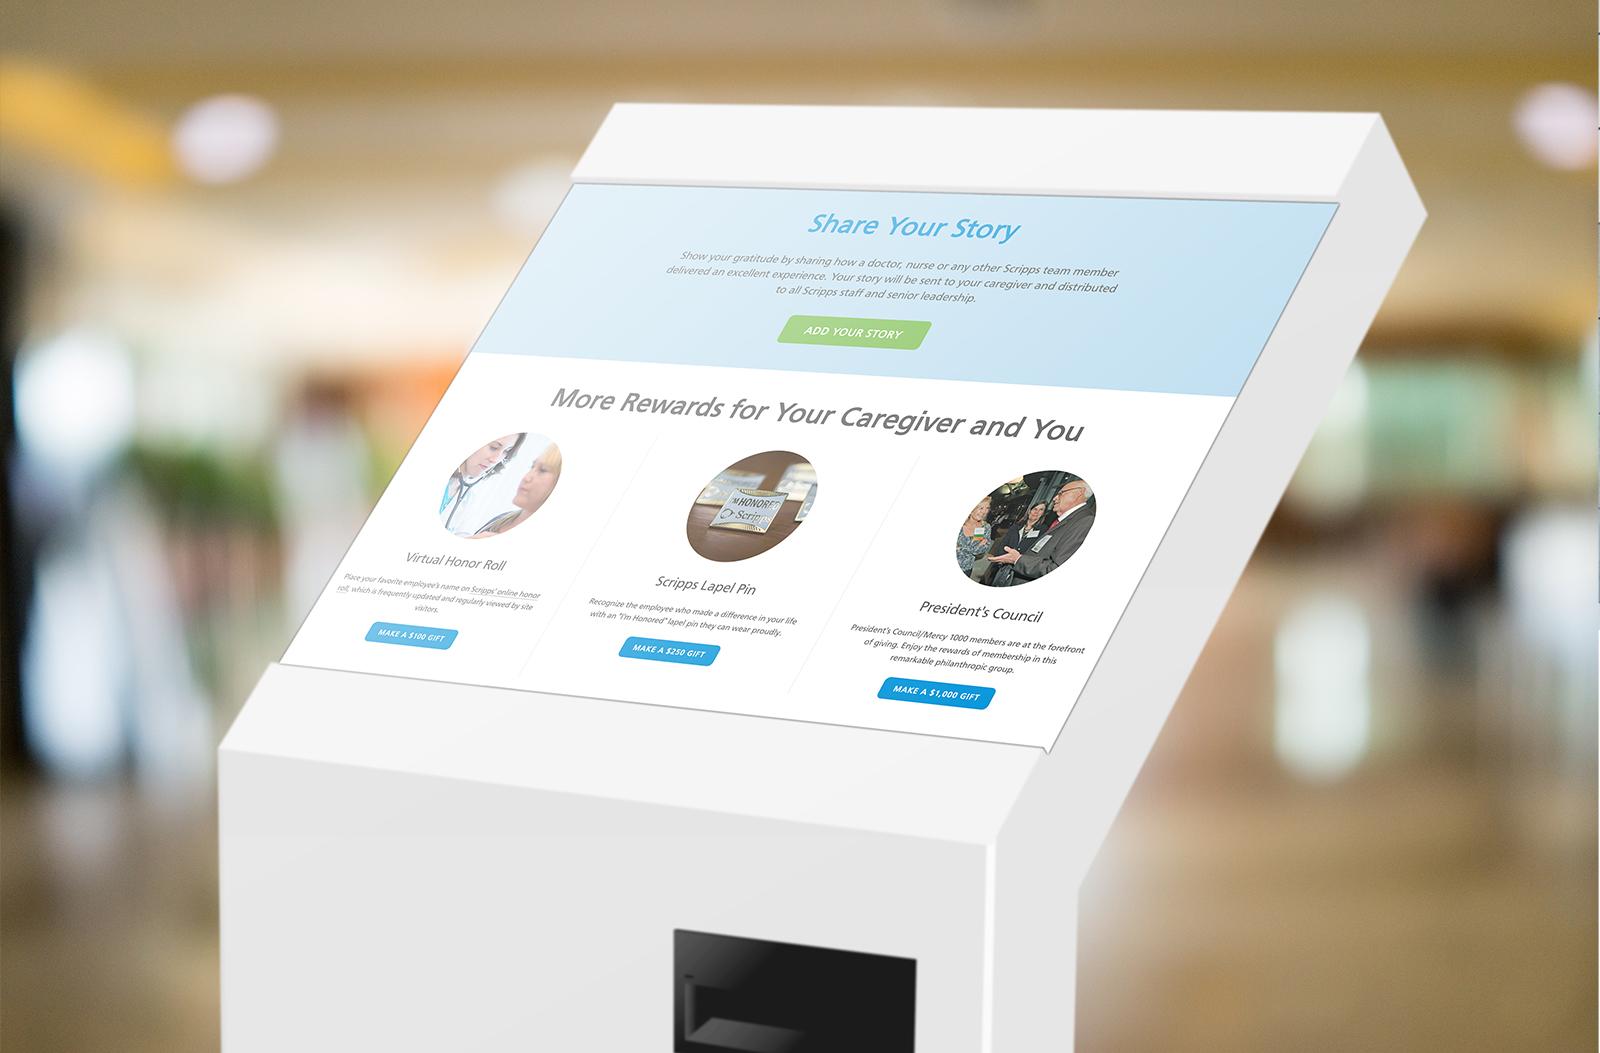 Scripps Honor Your Caregiver kiosk